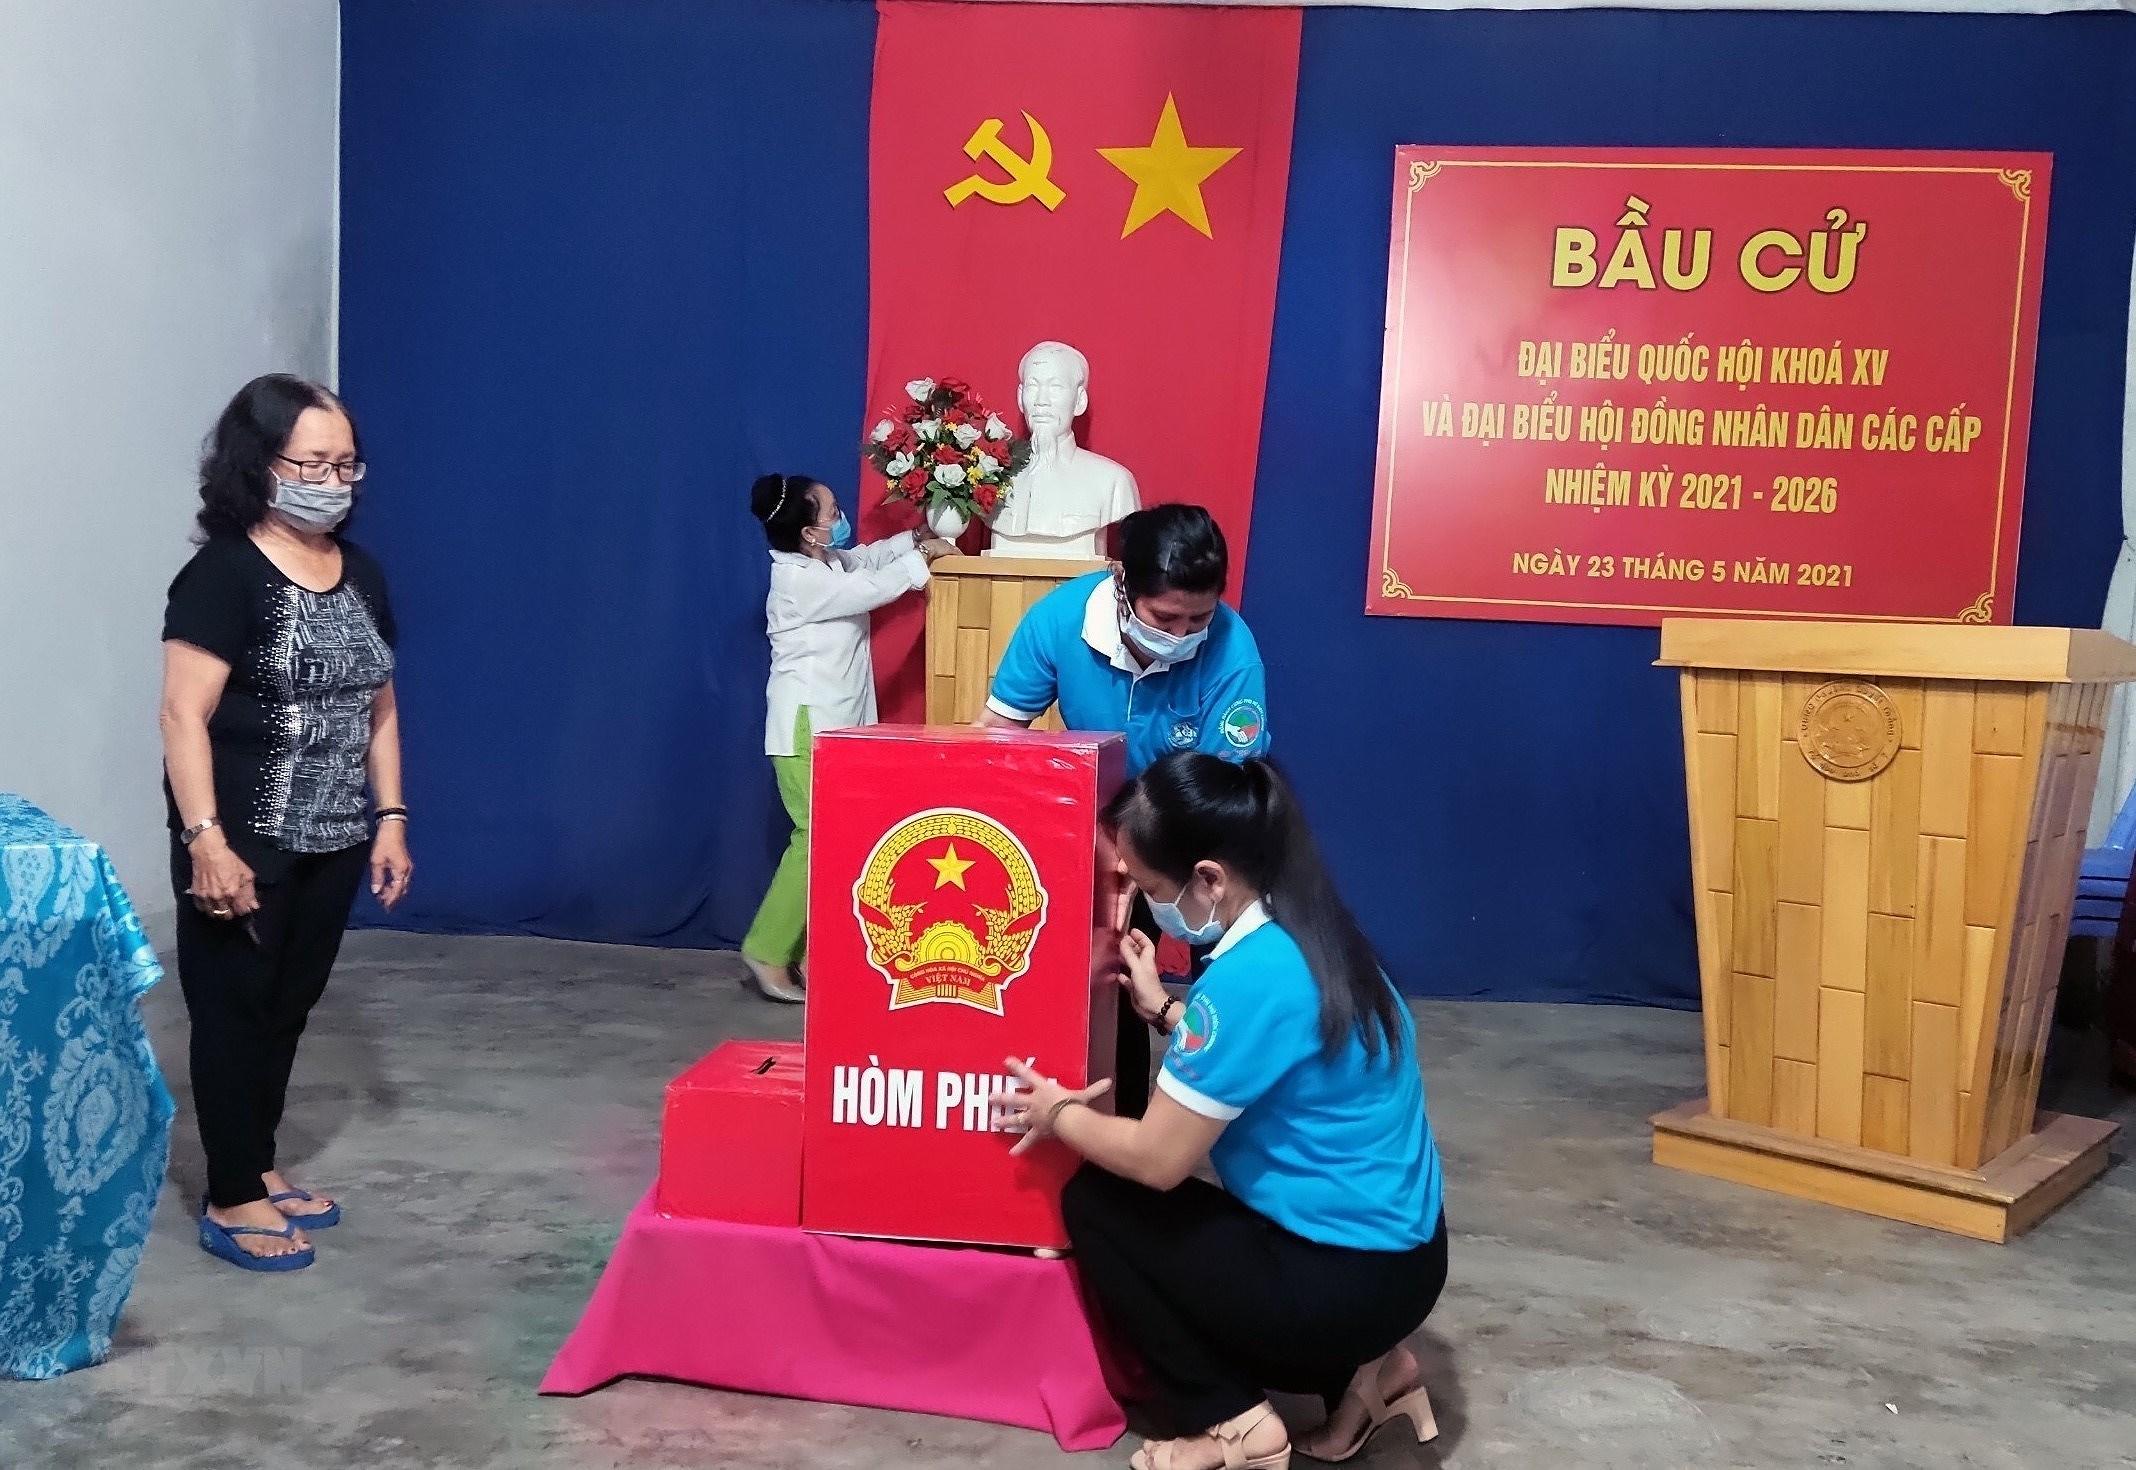 Chu dong phong chong dich COVID-19, dam bao an toan cho Ngay bau cu hinh anh 1